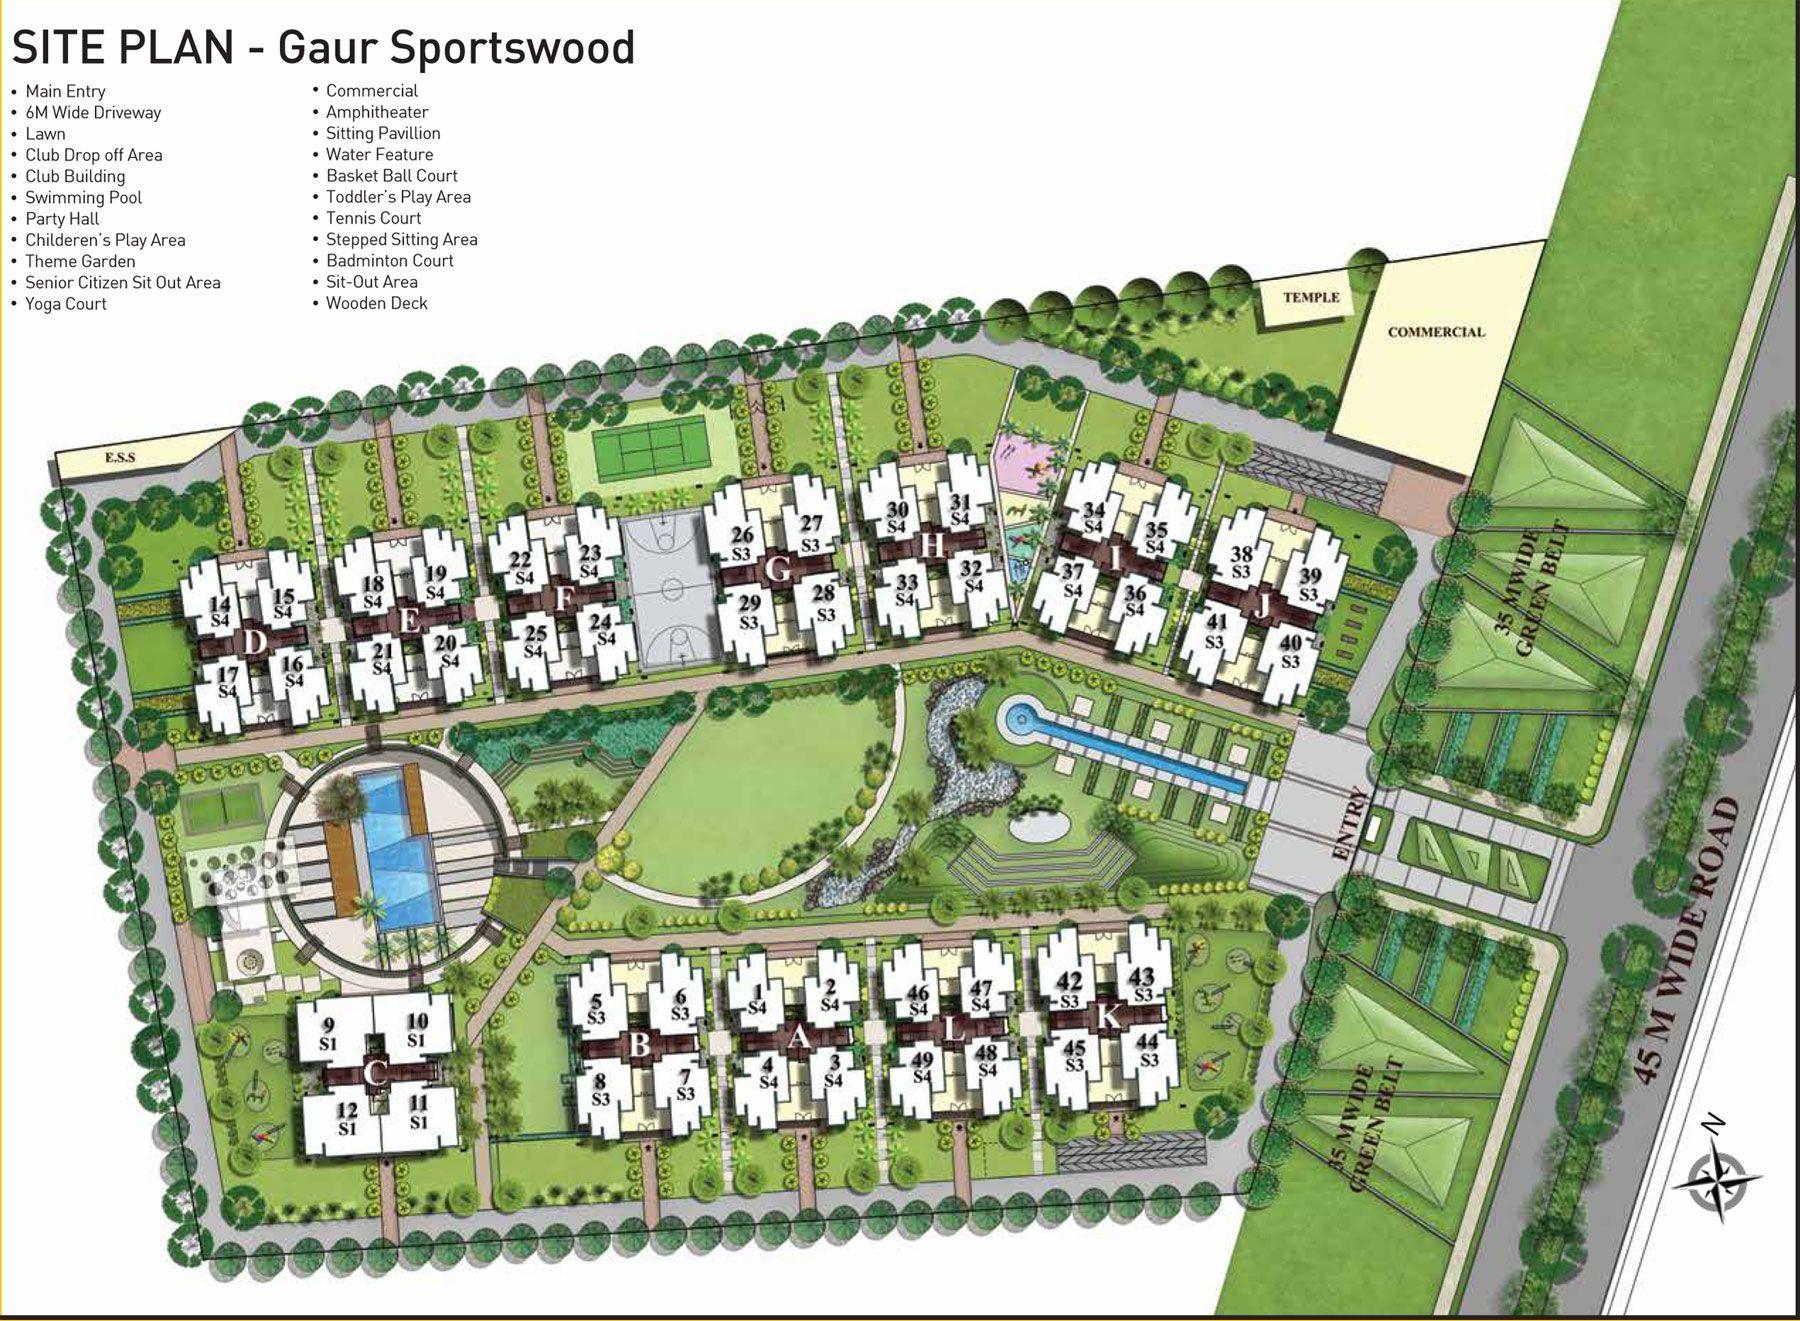 site_plan | Sadda Yard | Pinterest | Site plans